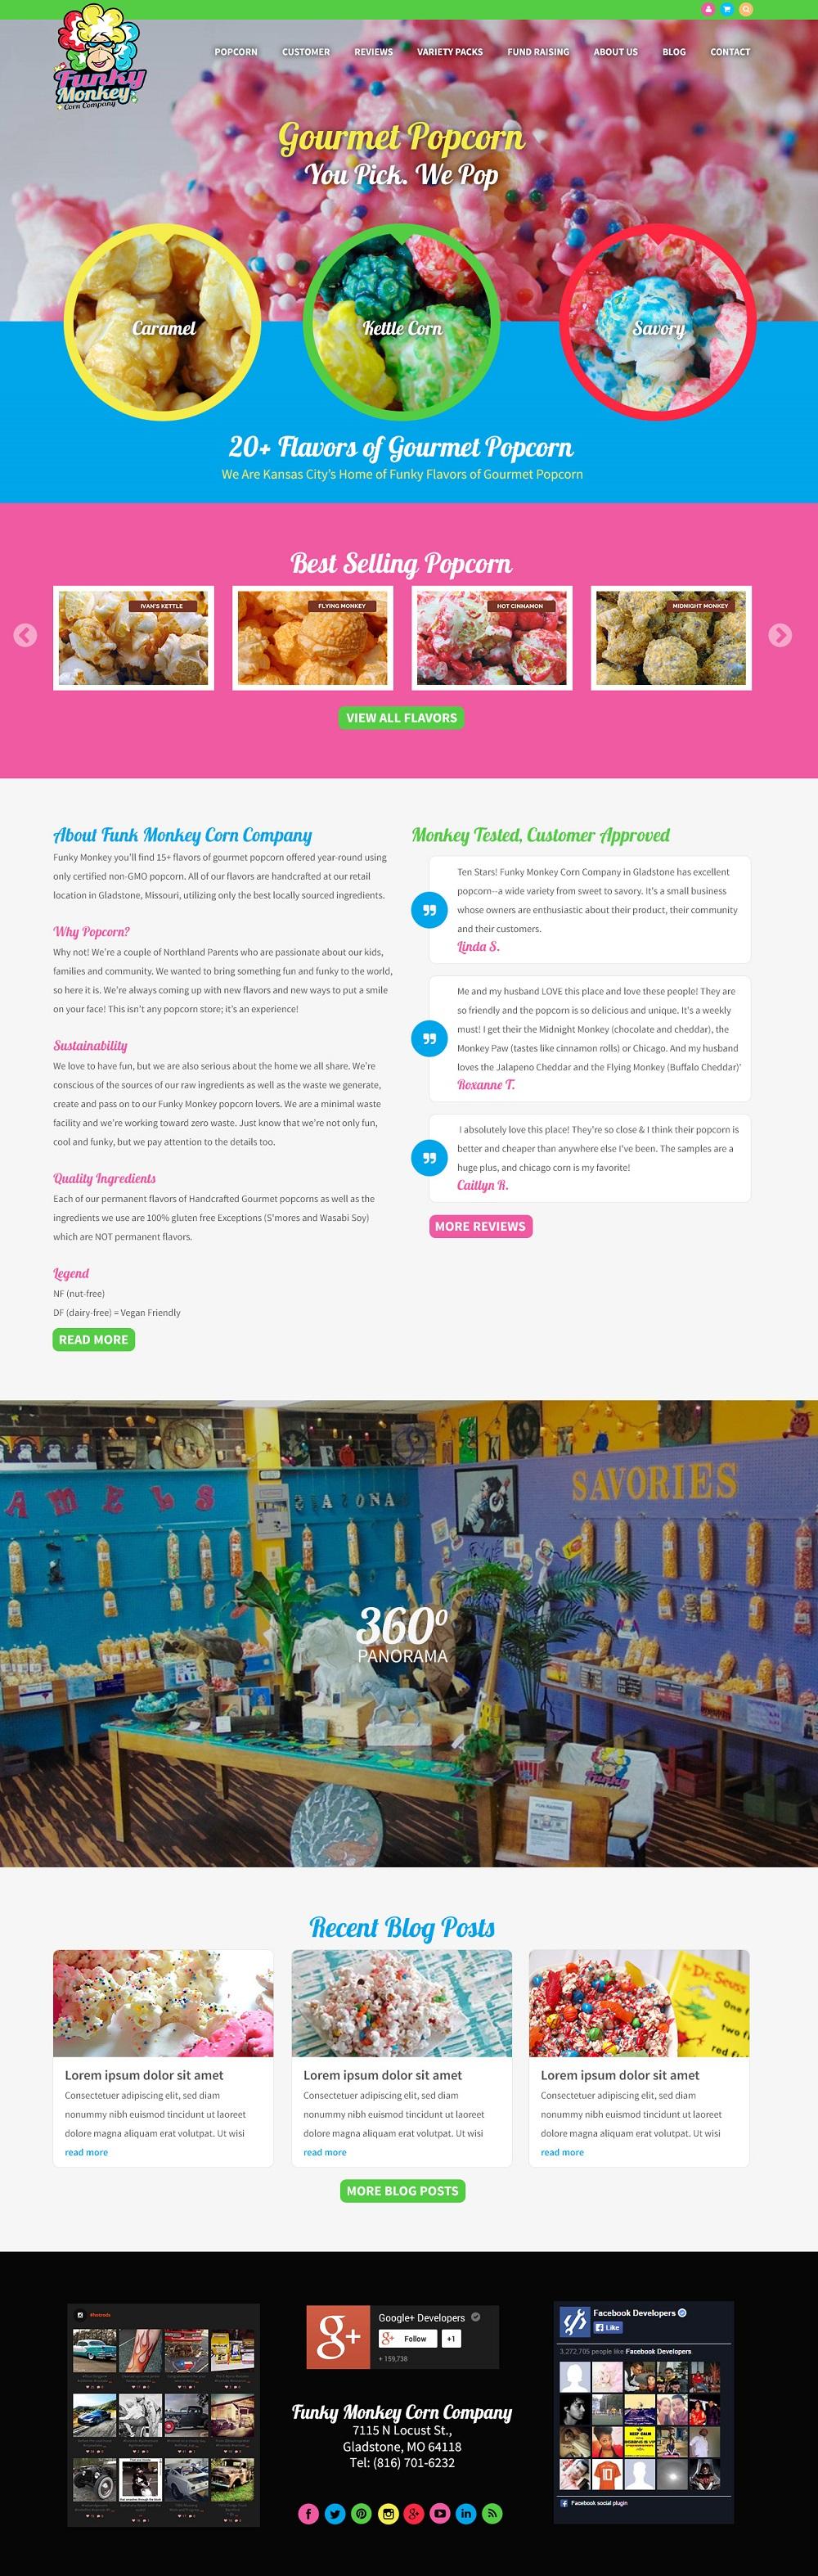 popcorn company website design